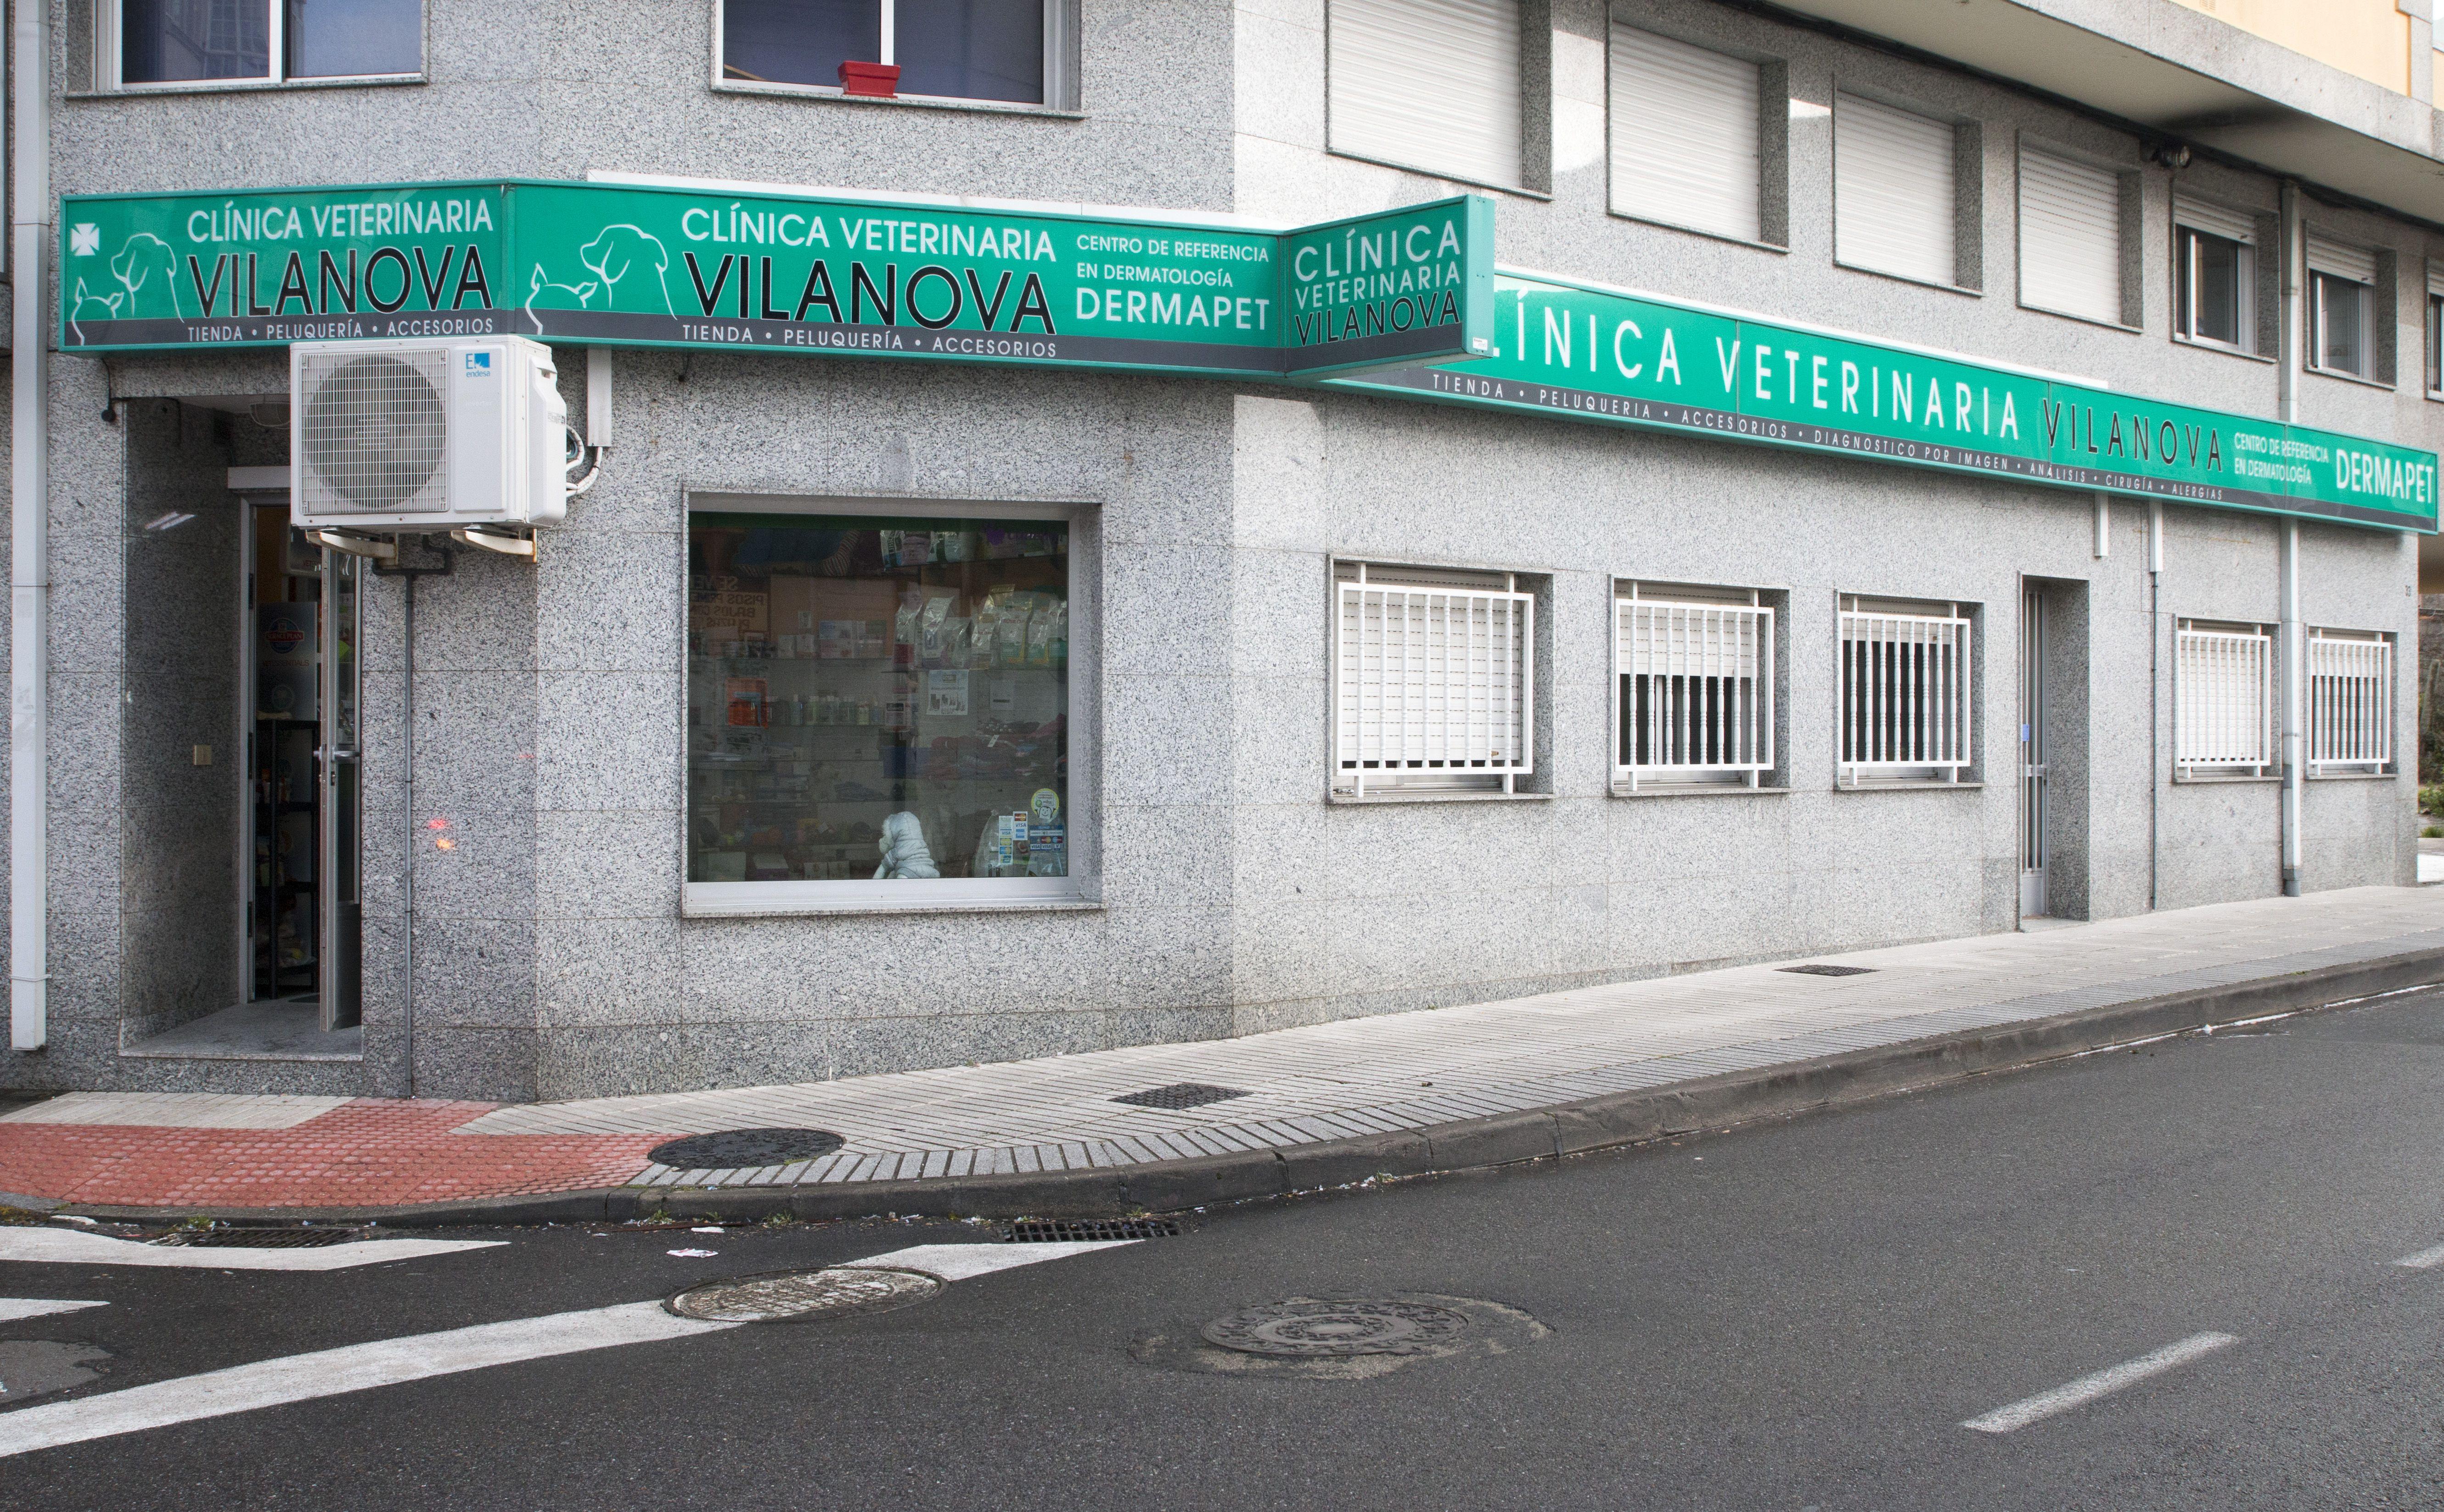 Foto 2 de Veterinarios en Vilanova de Arousa | Clínica Veterinaria Vilanova